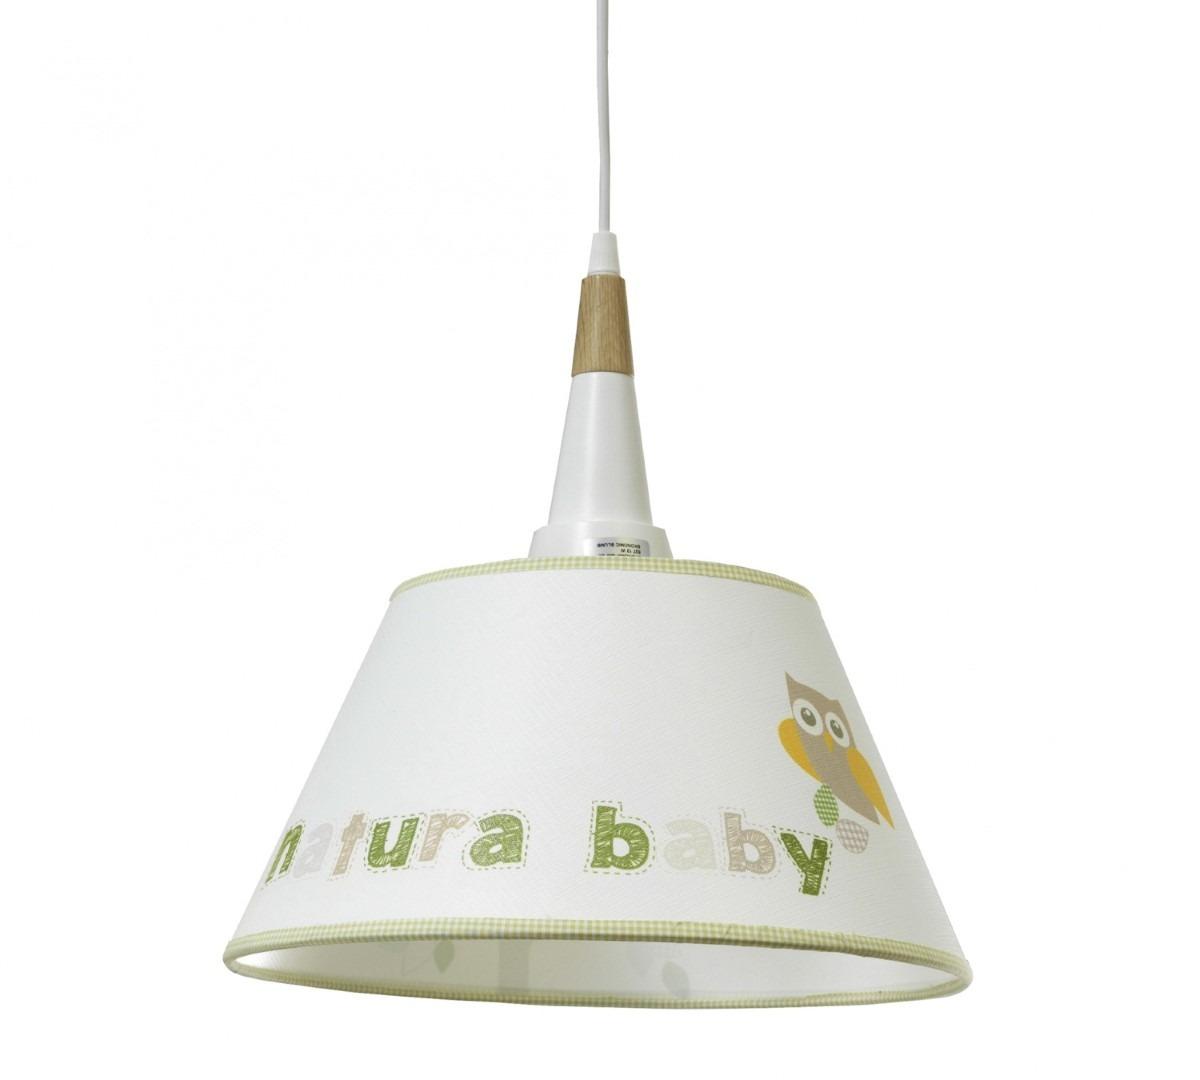 Natura-Baby-Ceiling-Lamp1